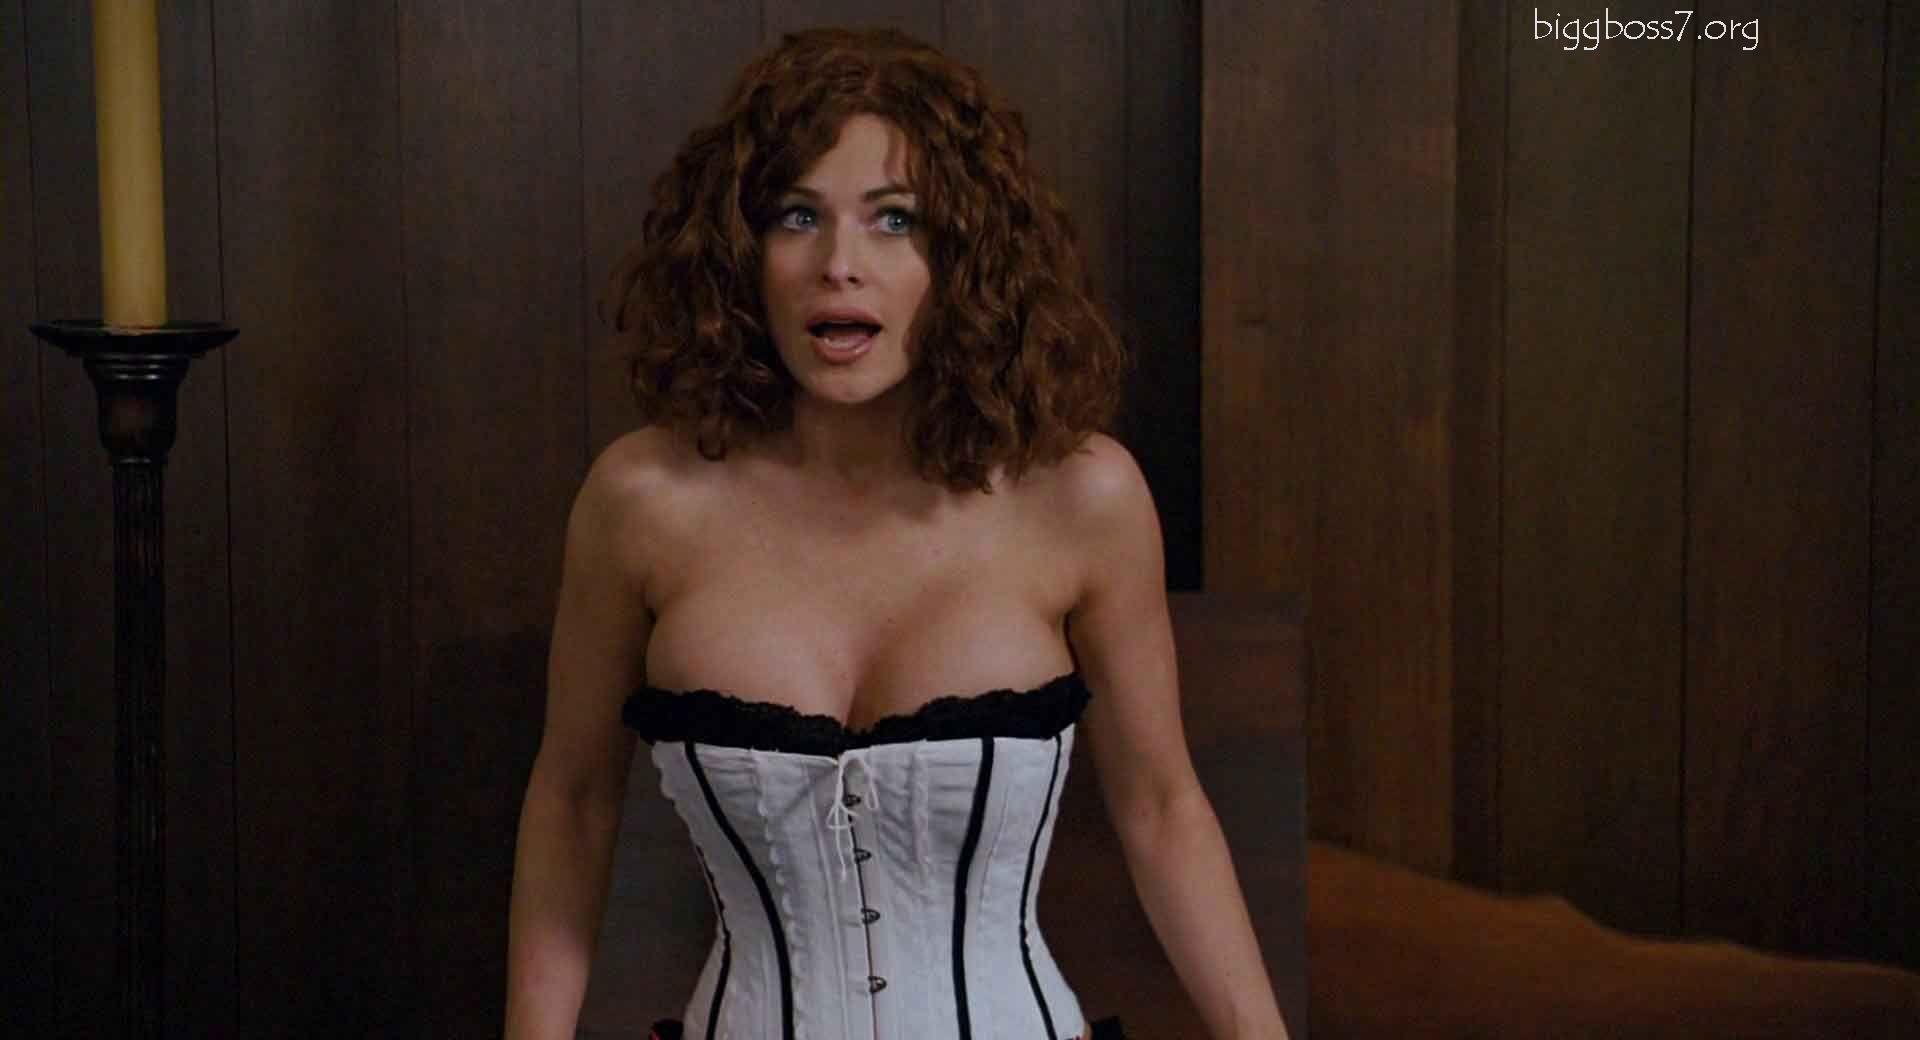 Carmen electra date movie scene 3